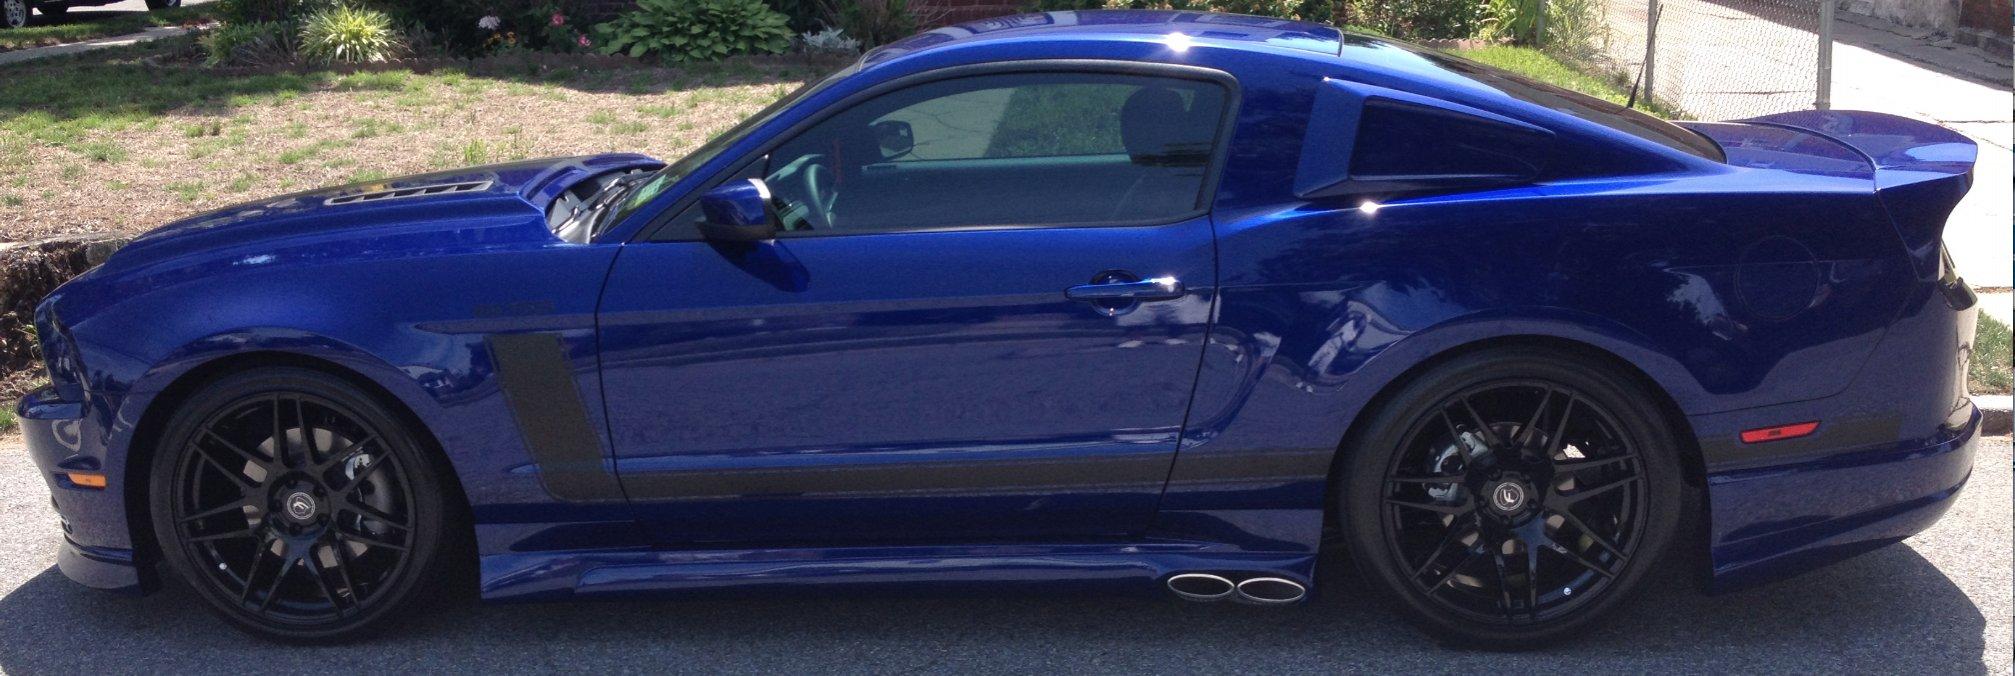 Black Strips or White Strips on Deep Blue Impact  Mustang Evolution